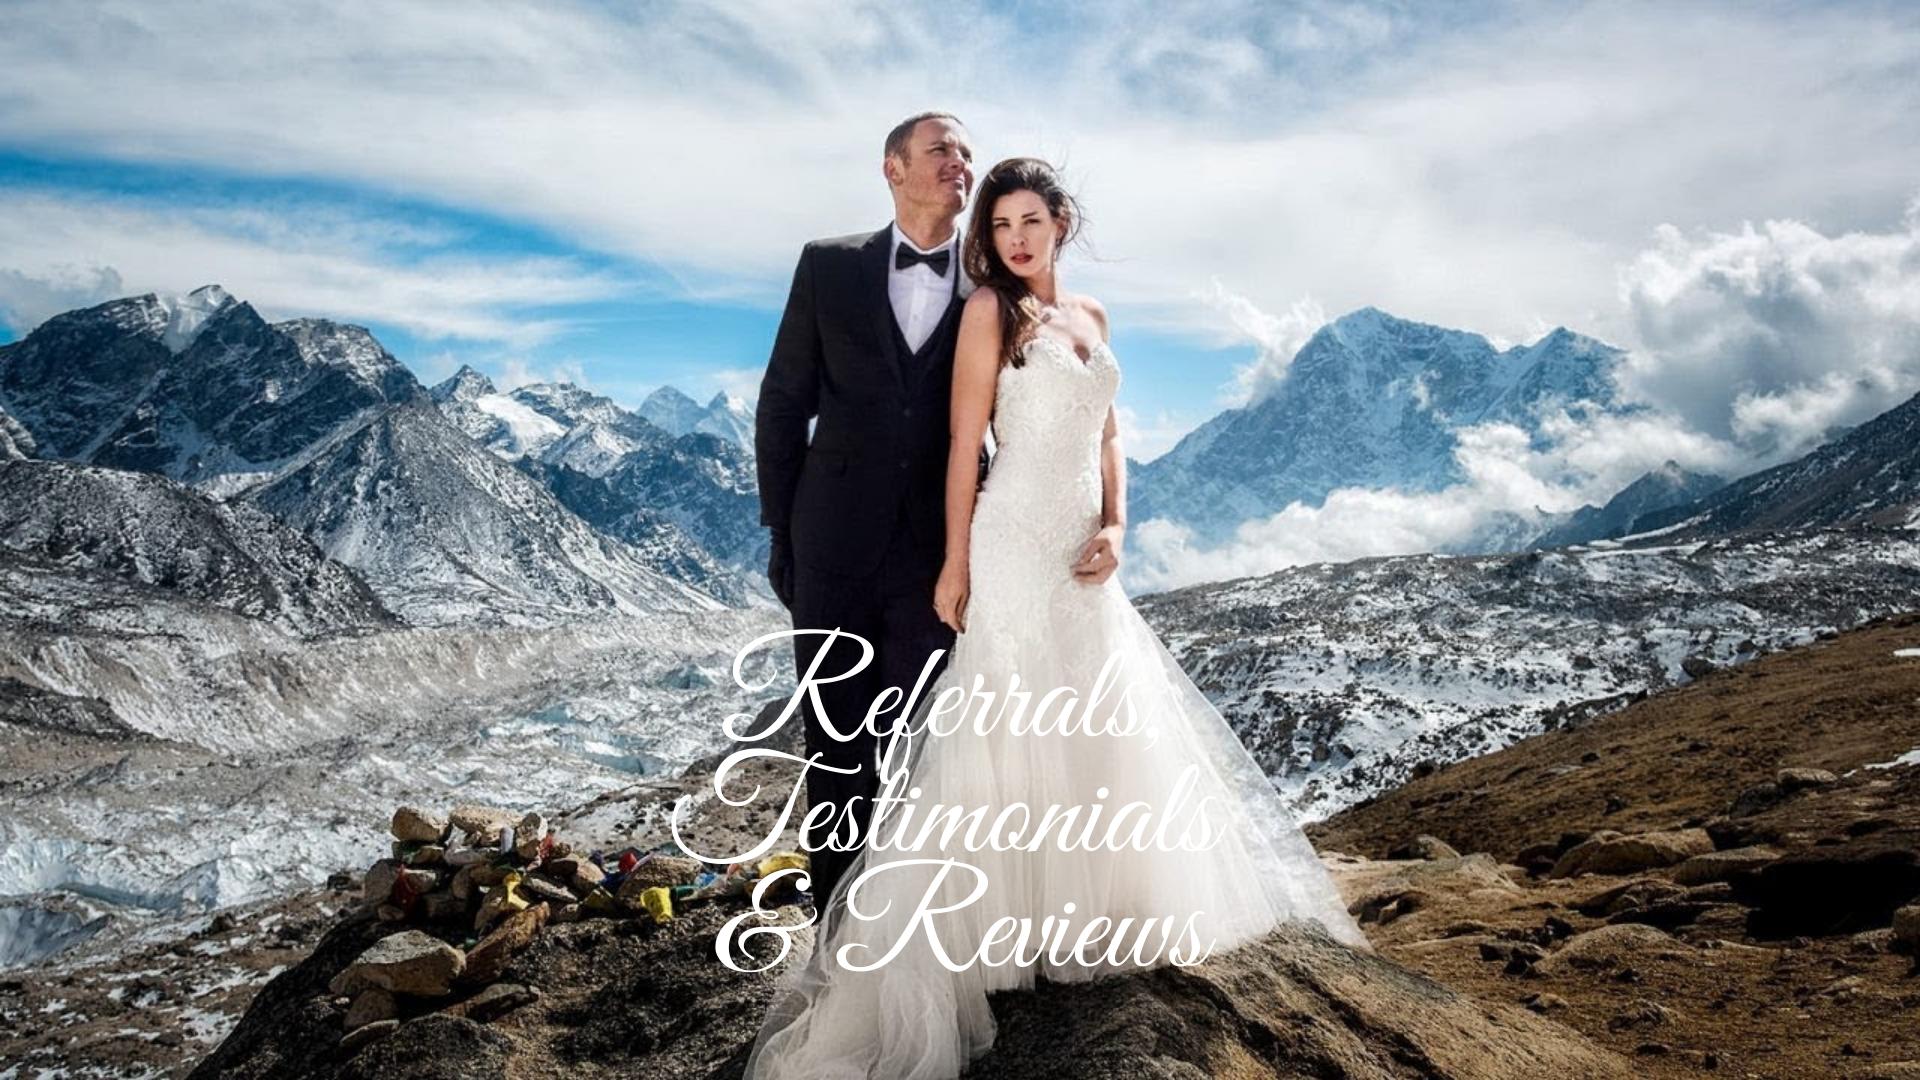 Referrals, Testimonials & Reviews